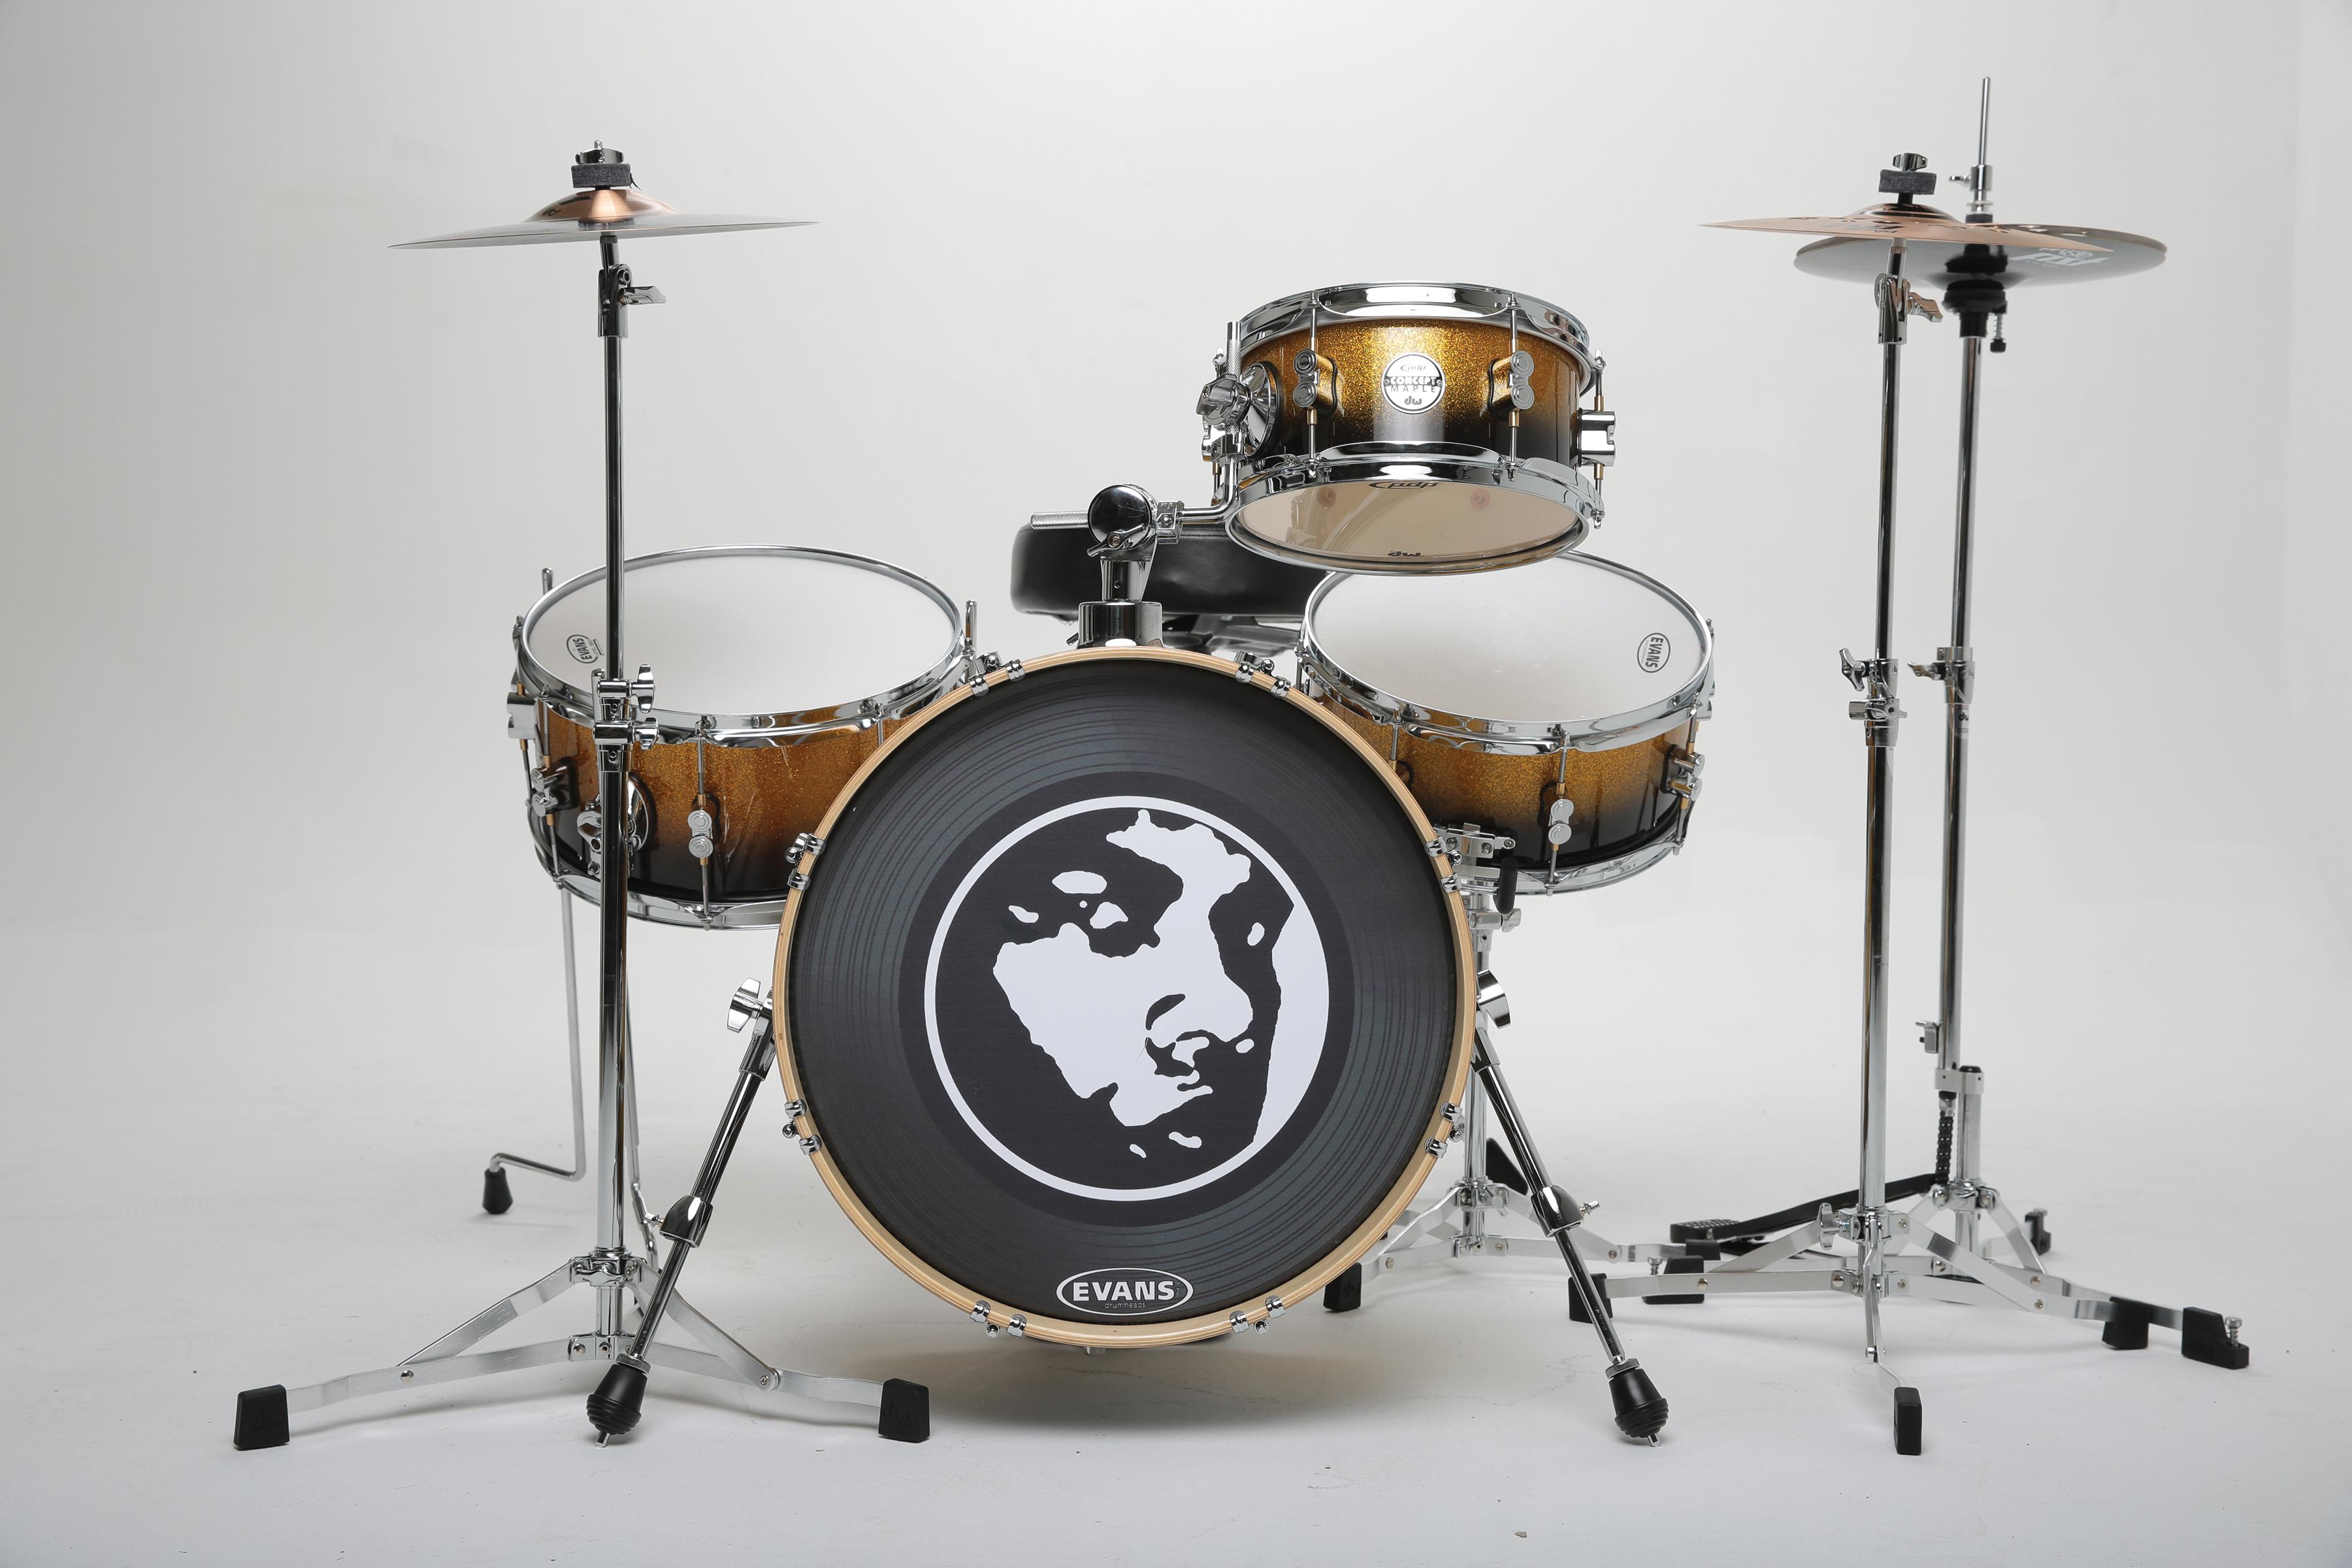 spaun 20th anniversary kit pdp daru jones new yorker kit trx cymbals and more modern. Black Bedroom Furniture Sets. Home Design Ideas